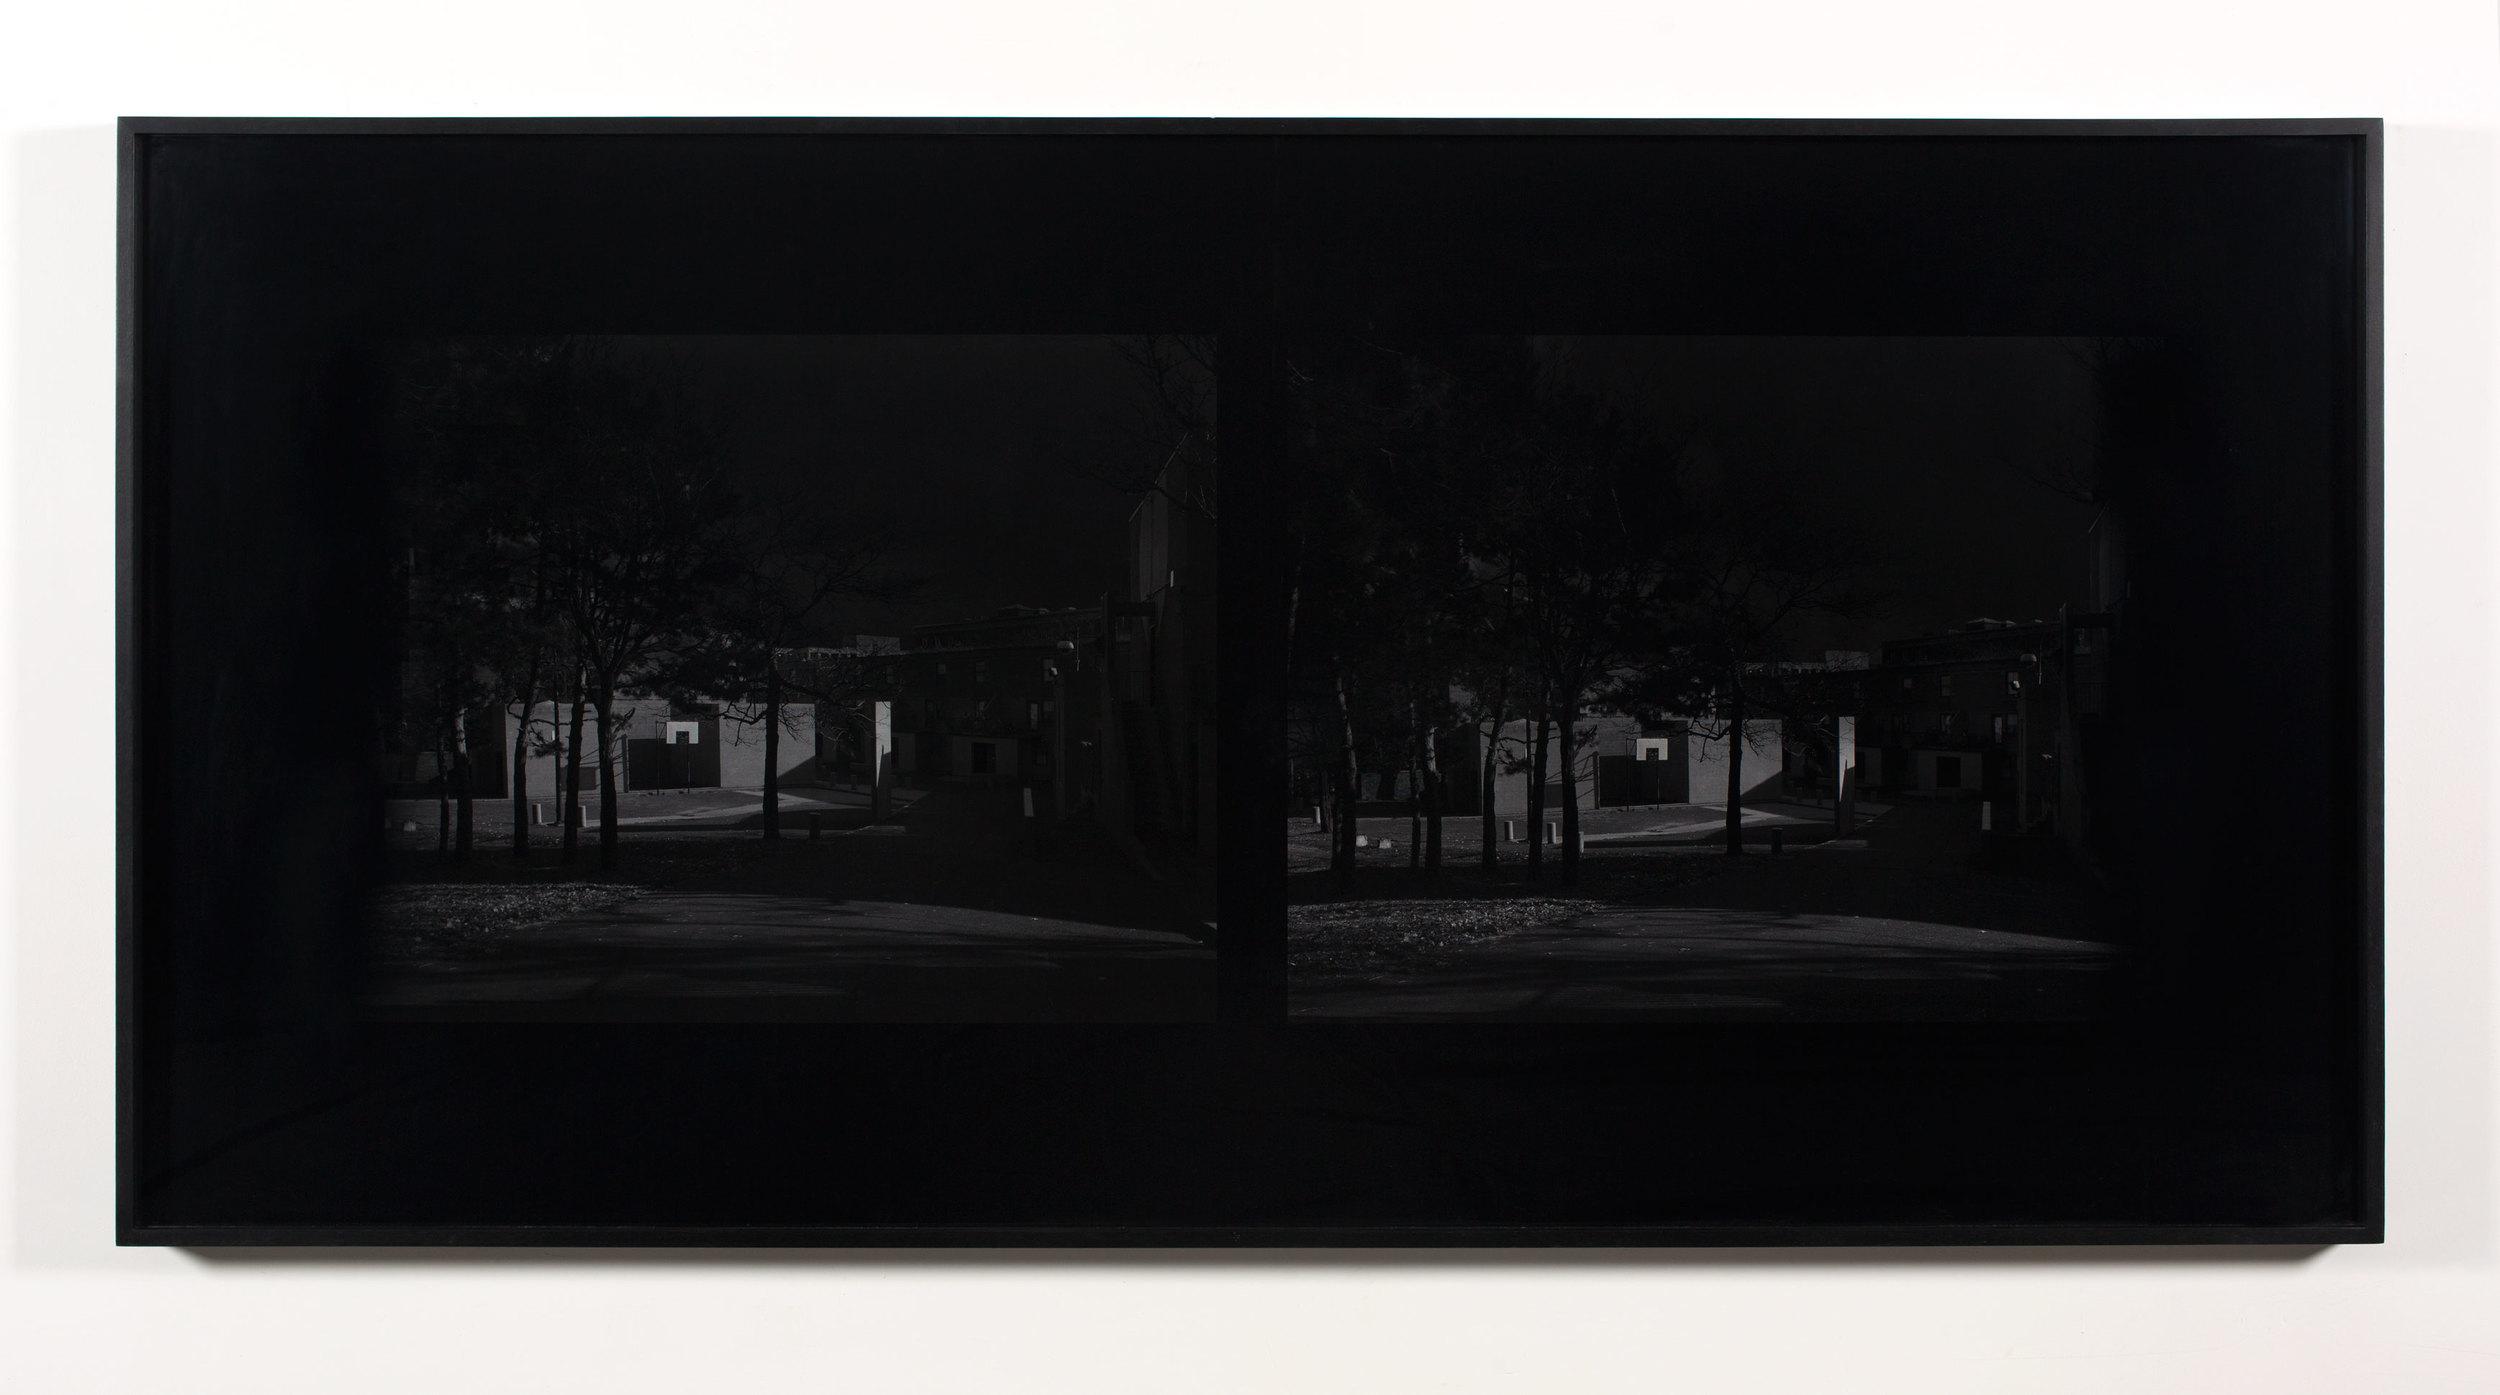 Excursionist Views (Church St. Housing, 1969, courtyard detail)    2001/2005   Chromogenic print  48 x 96 inches